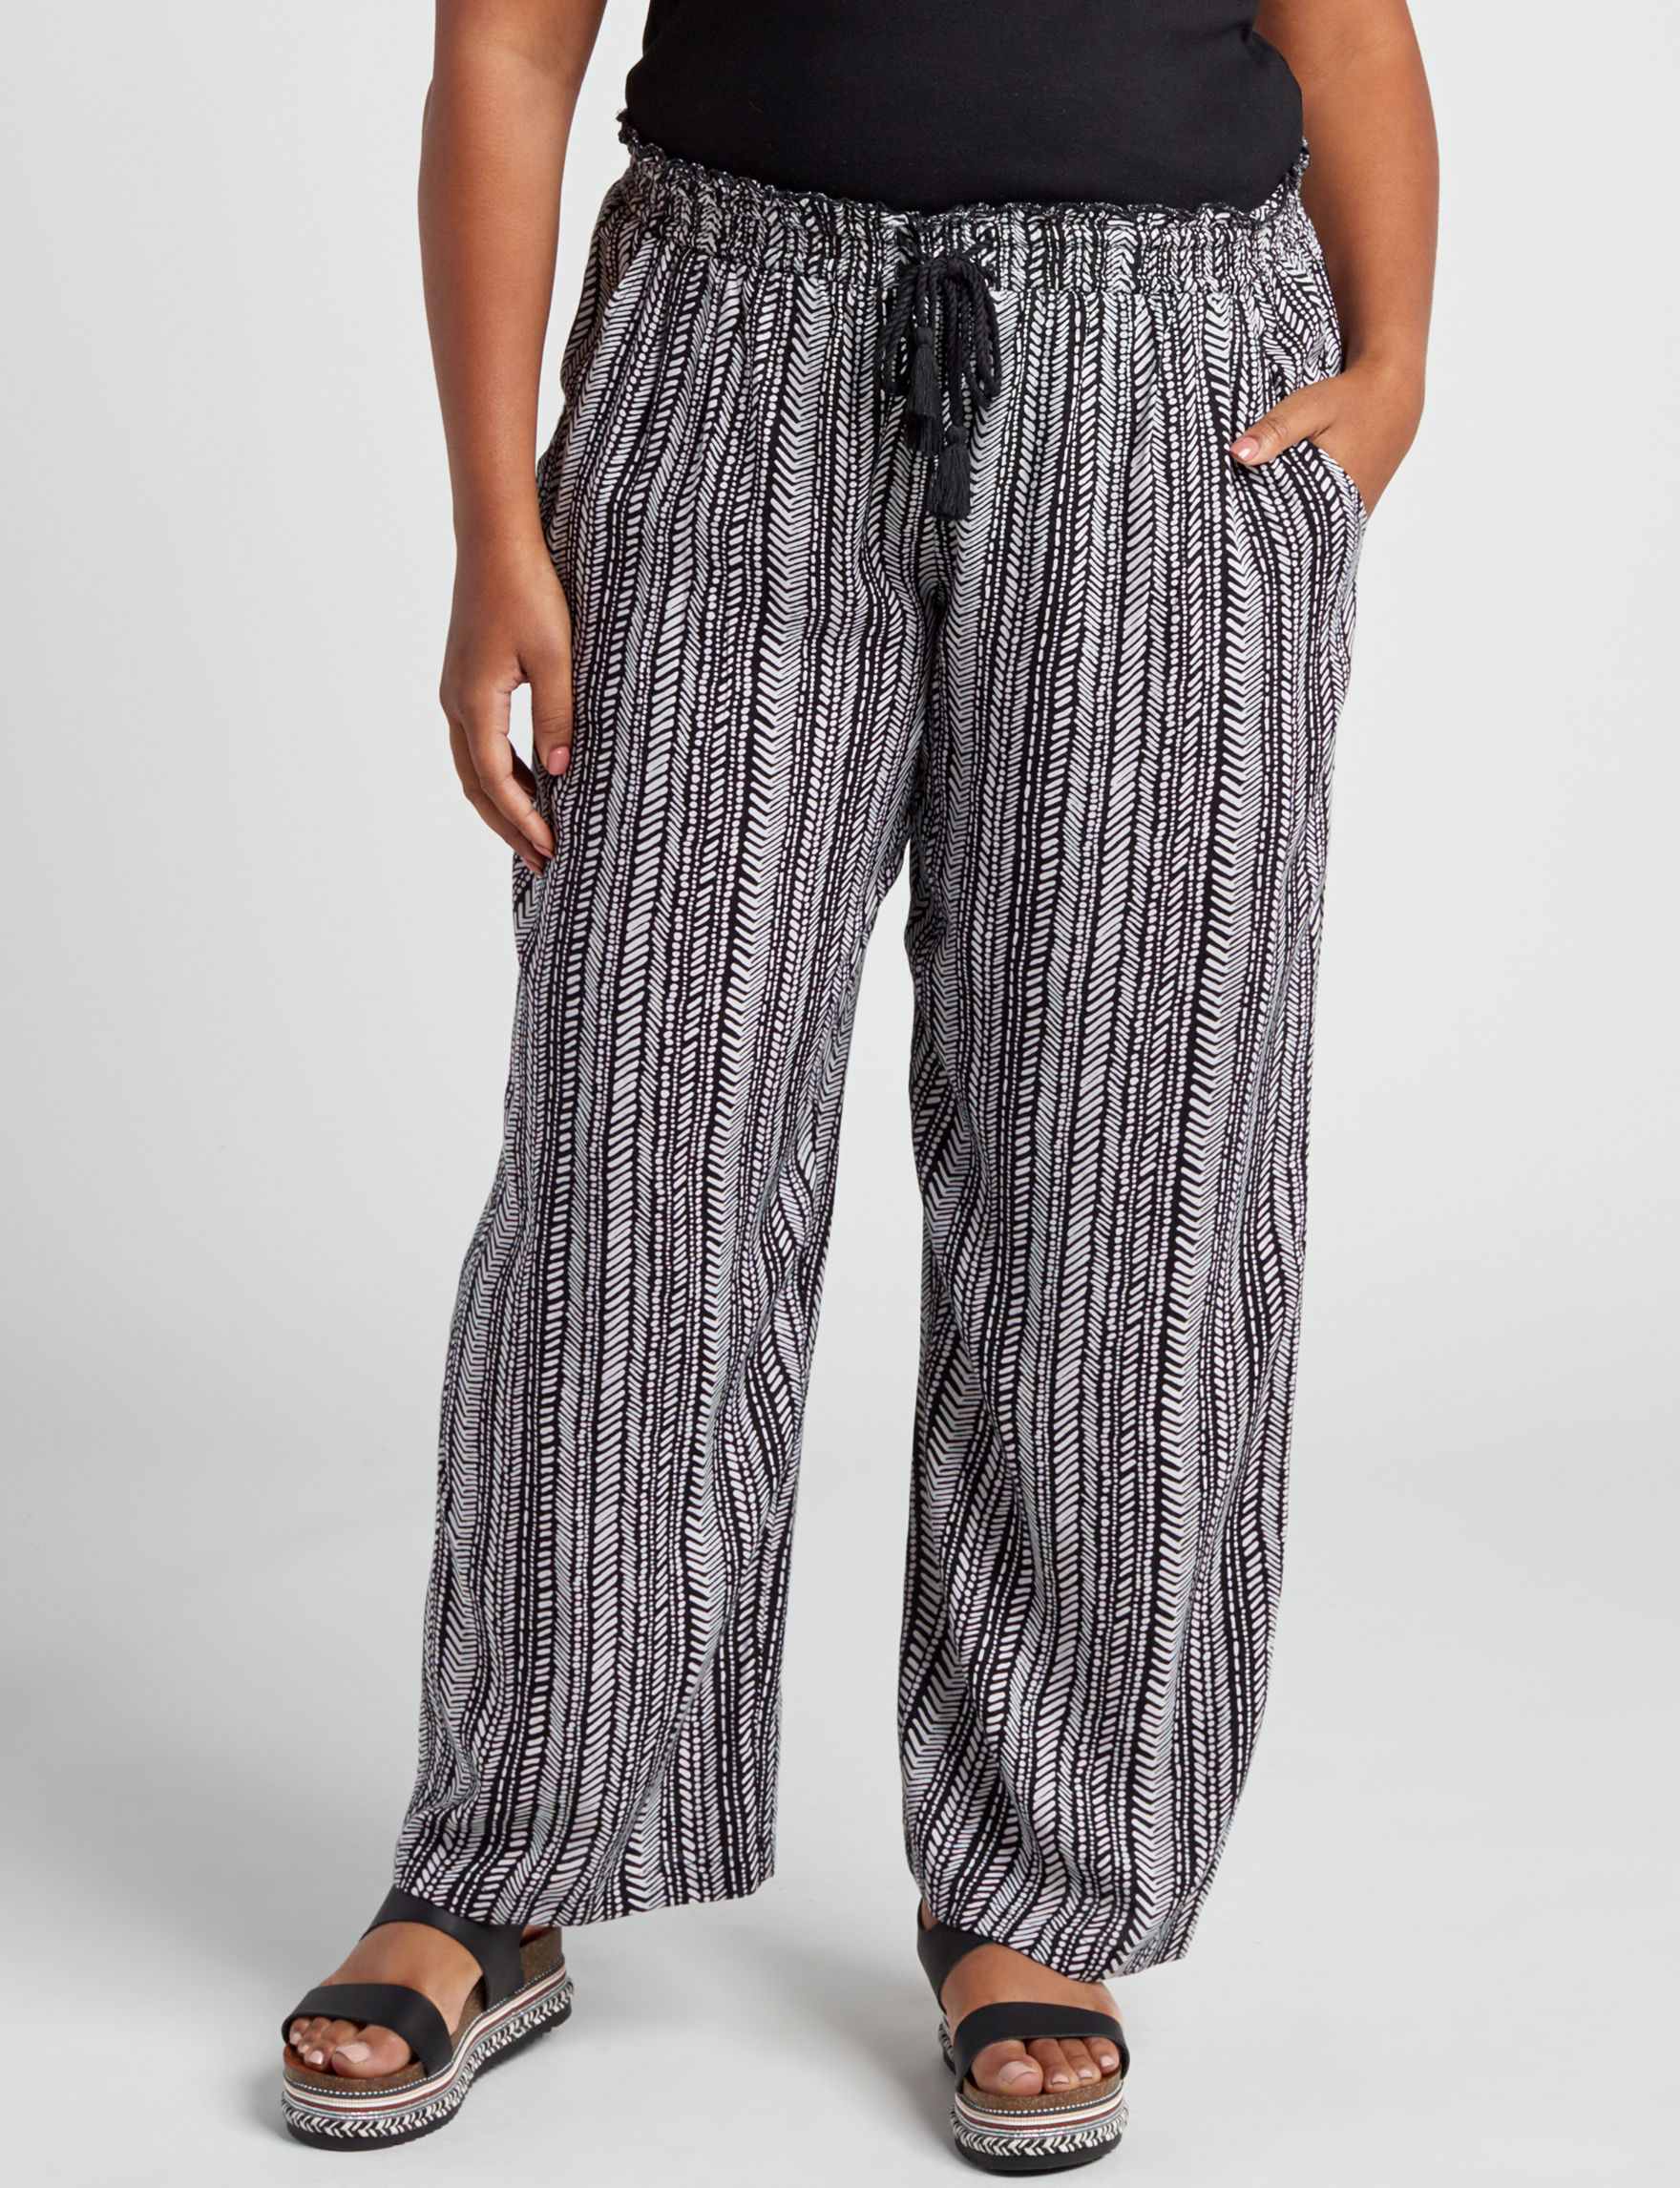 New Direction Black / White Soft Pants